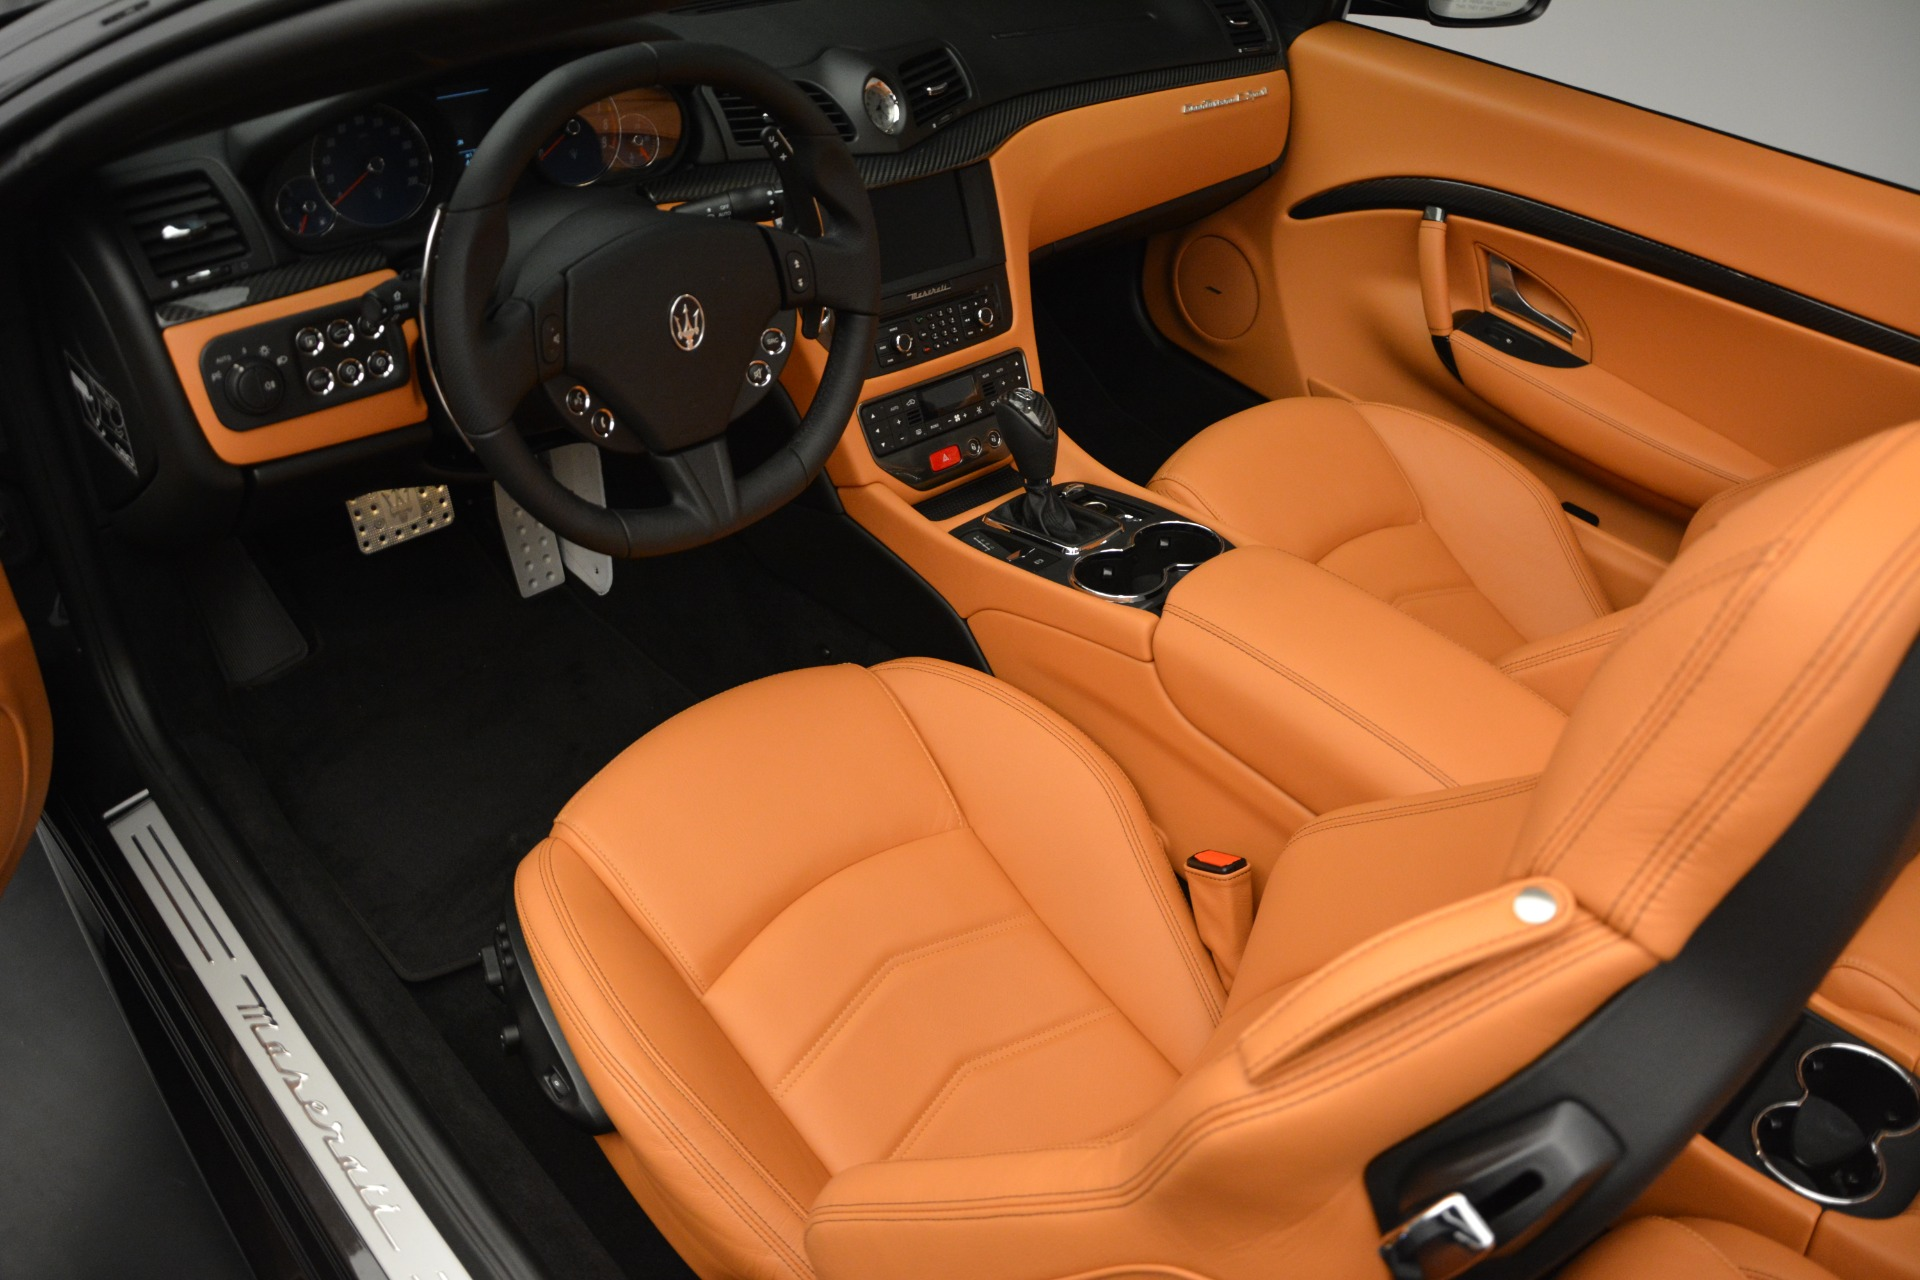 Used 2015 Maserati GranTurismo Sport Convertible For Sale In Westport, CT 2129_p19